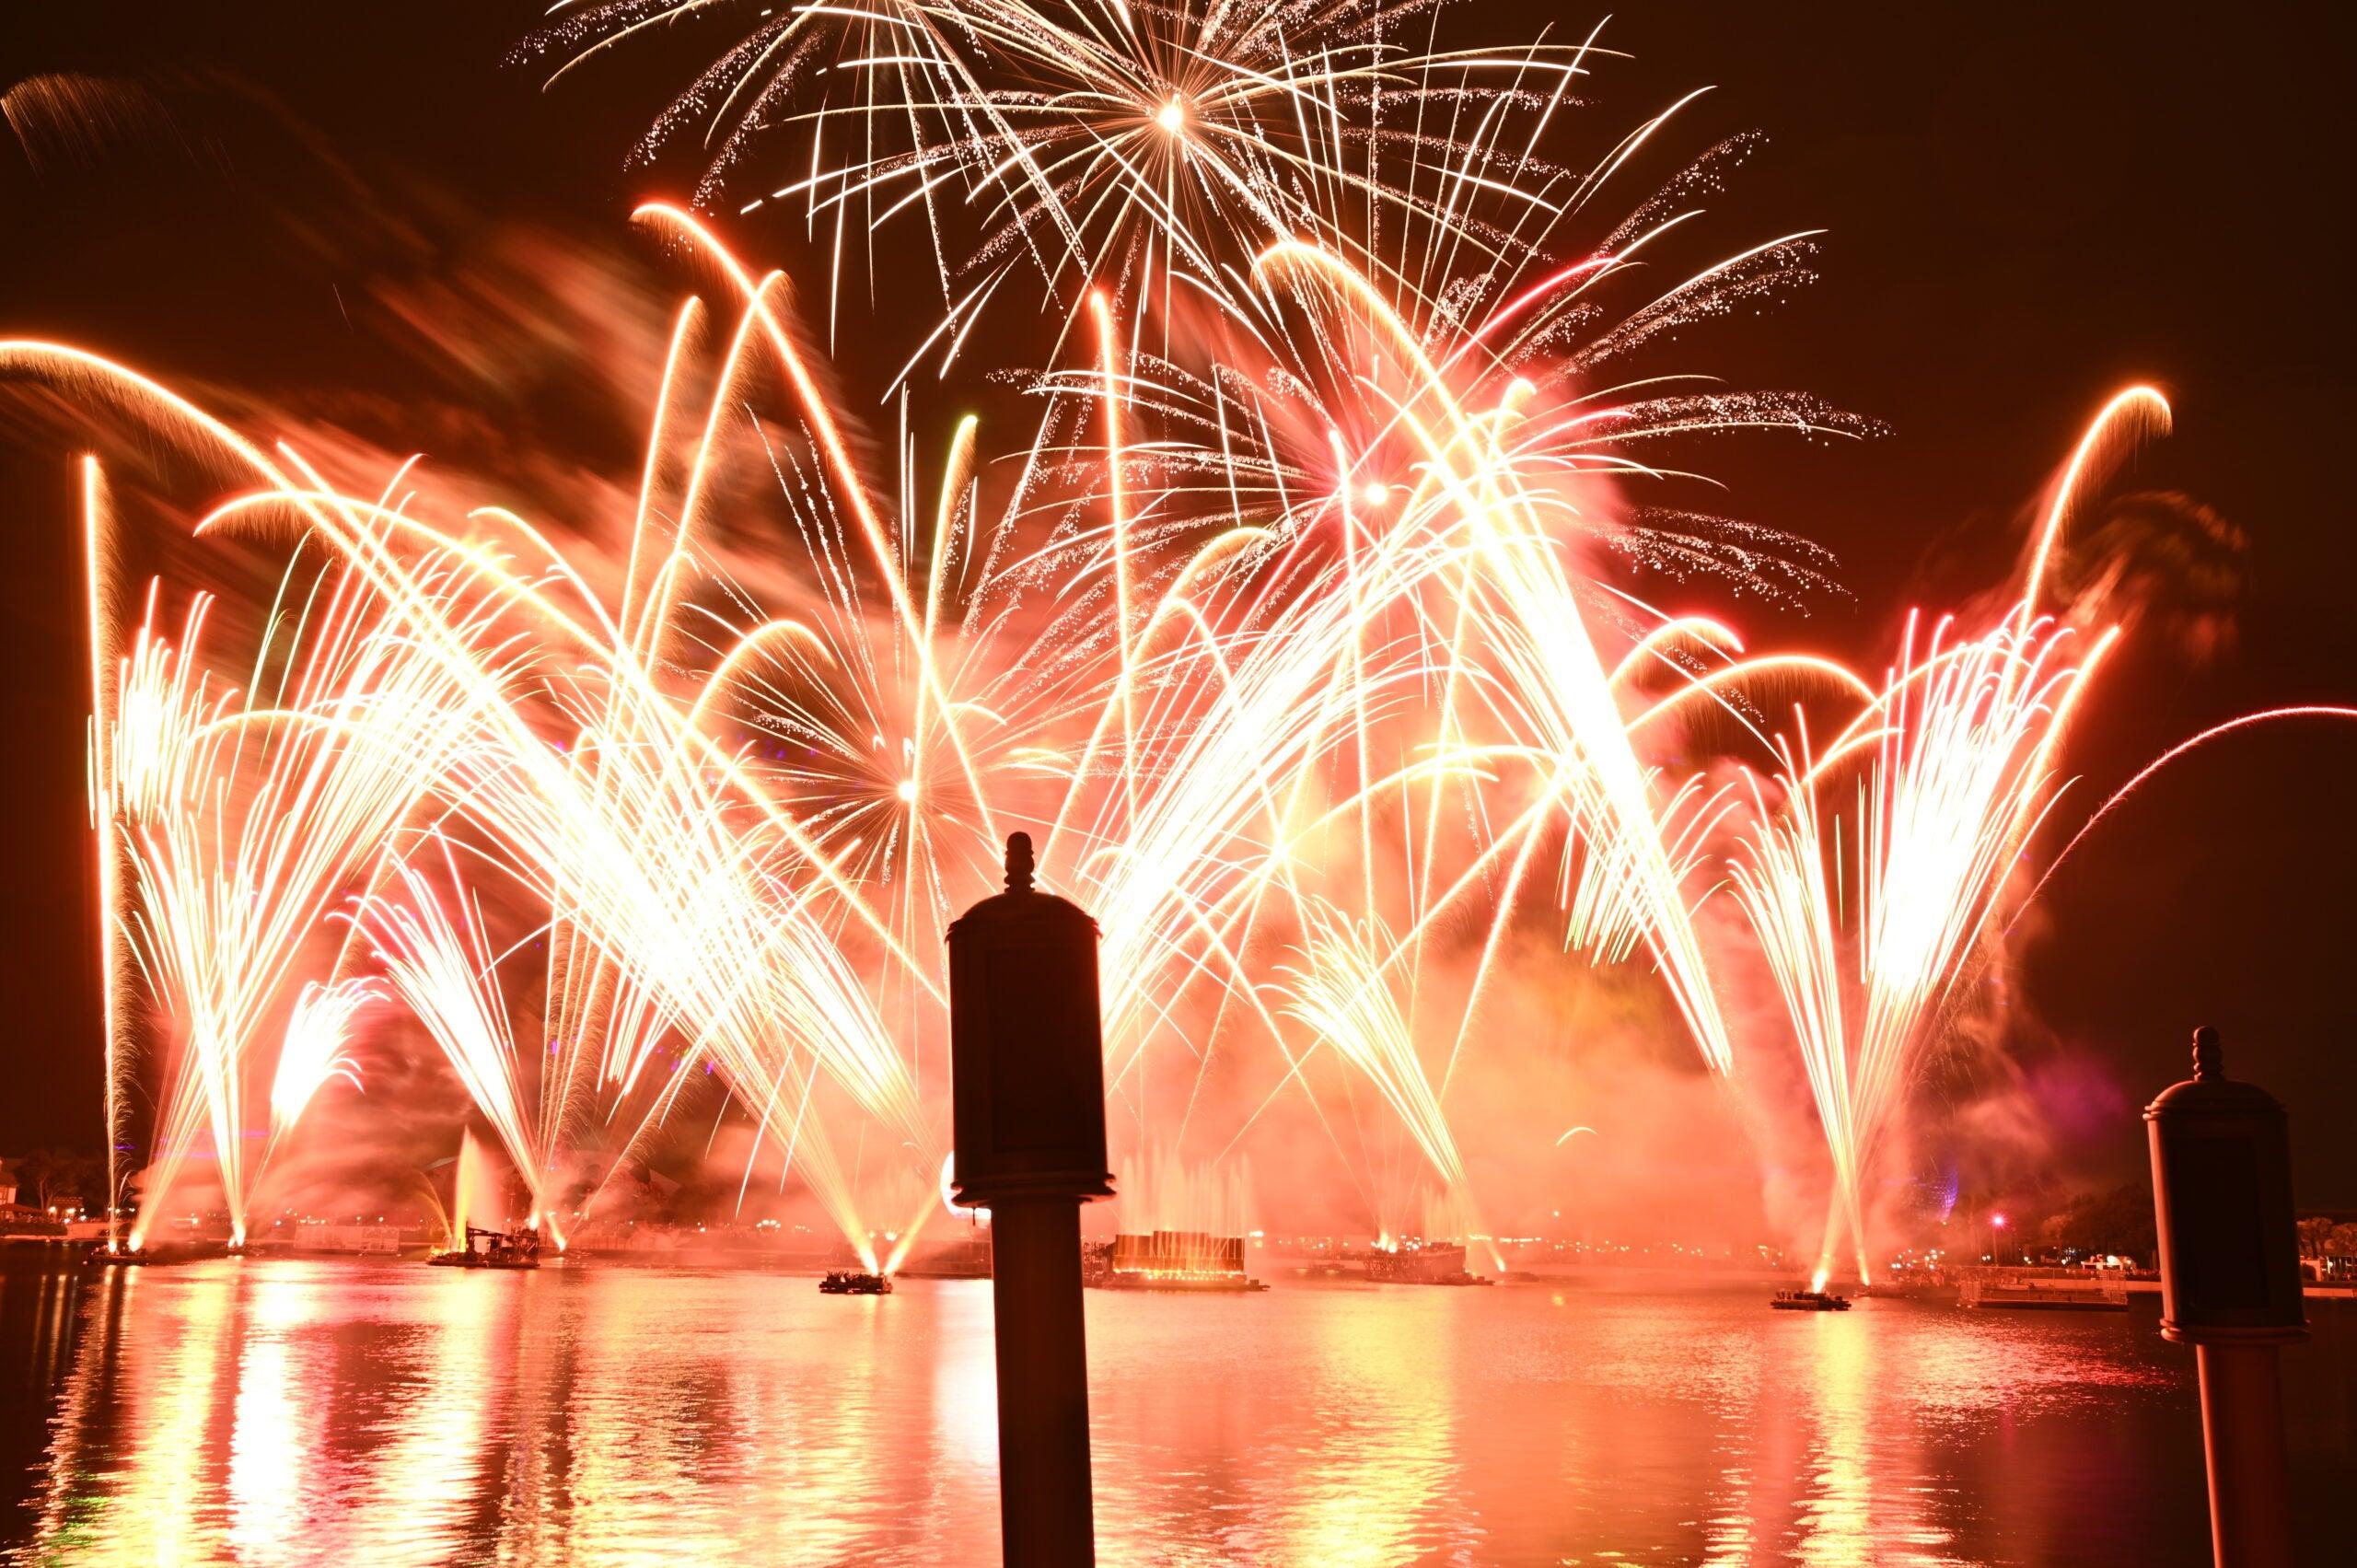 Capture raw fireworks photos